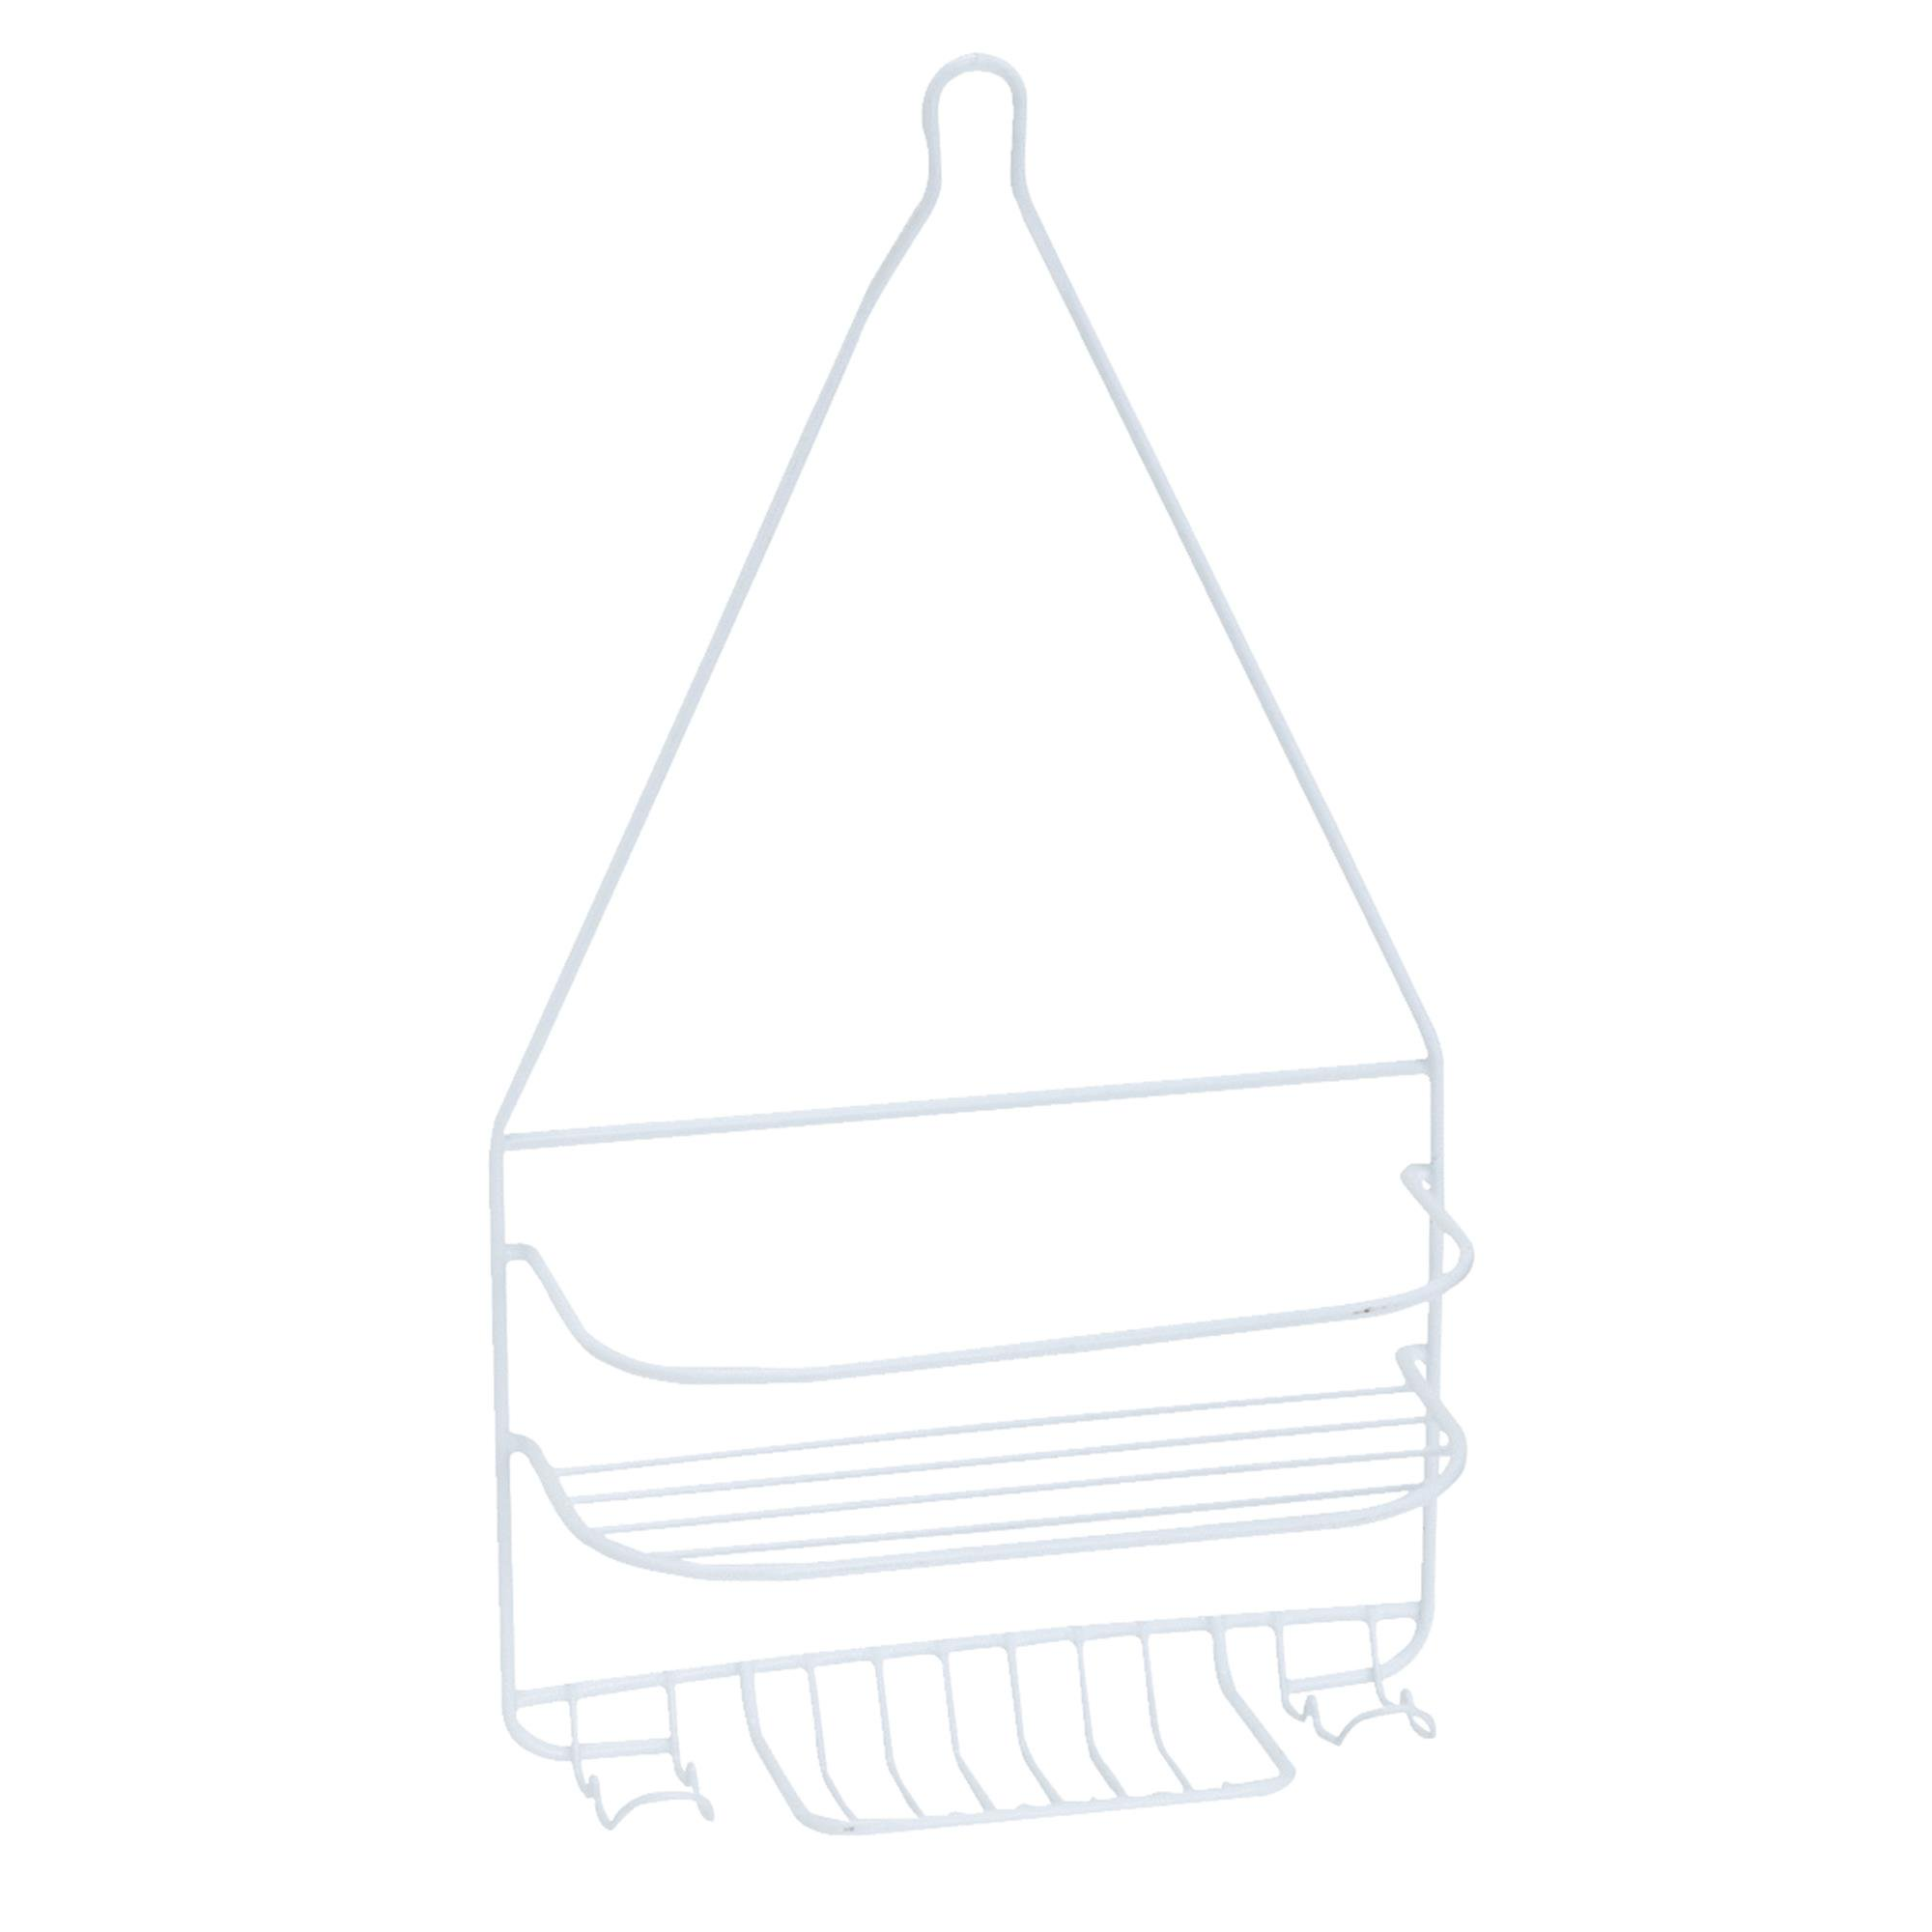 Homz Shower Caddy by SELFIX INC